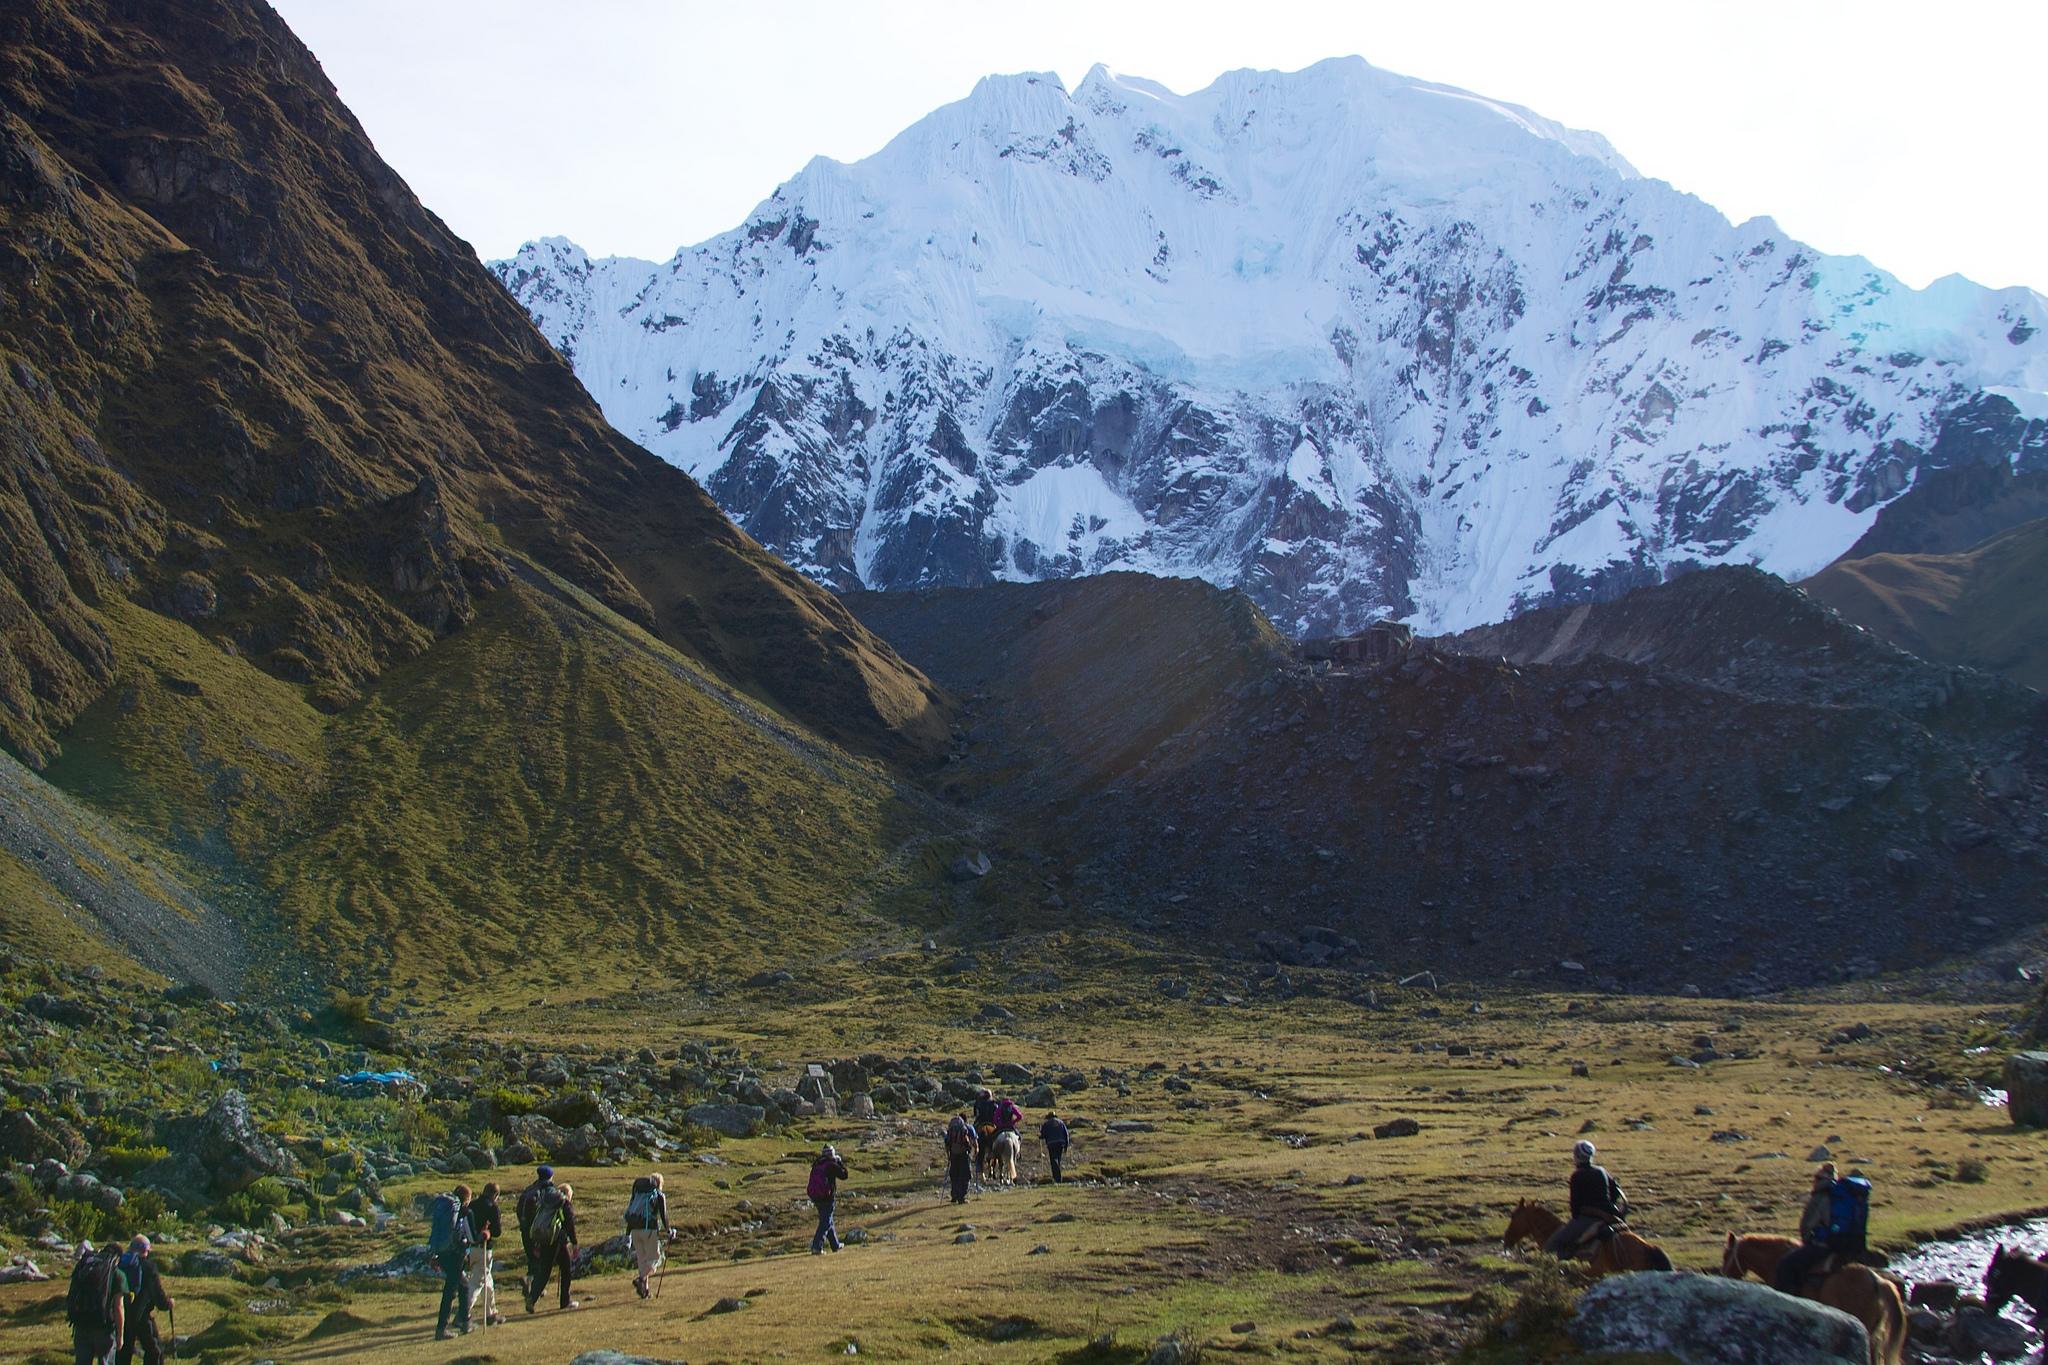 Blog Viagens Machu Picchu_Trilha_em_grupo_photoby_mckaysavage_via_visualhunt